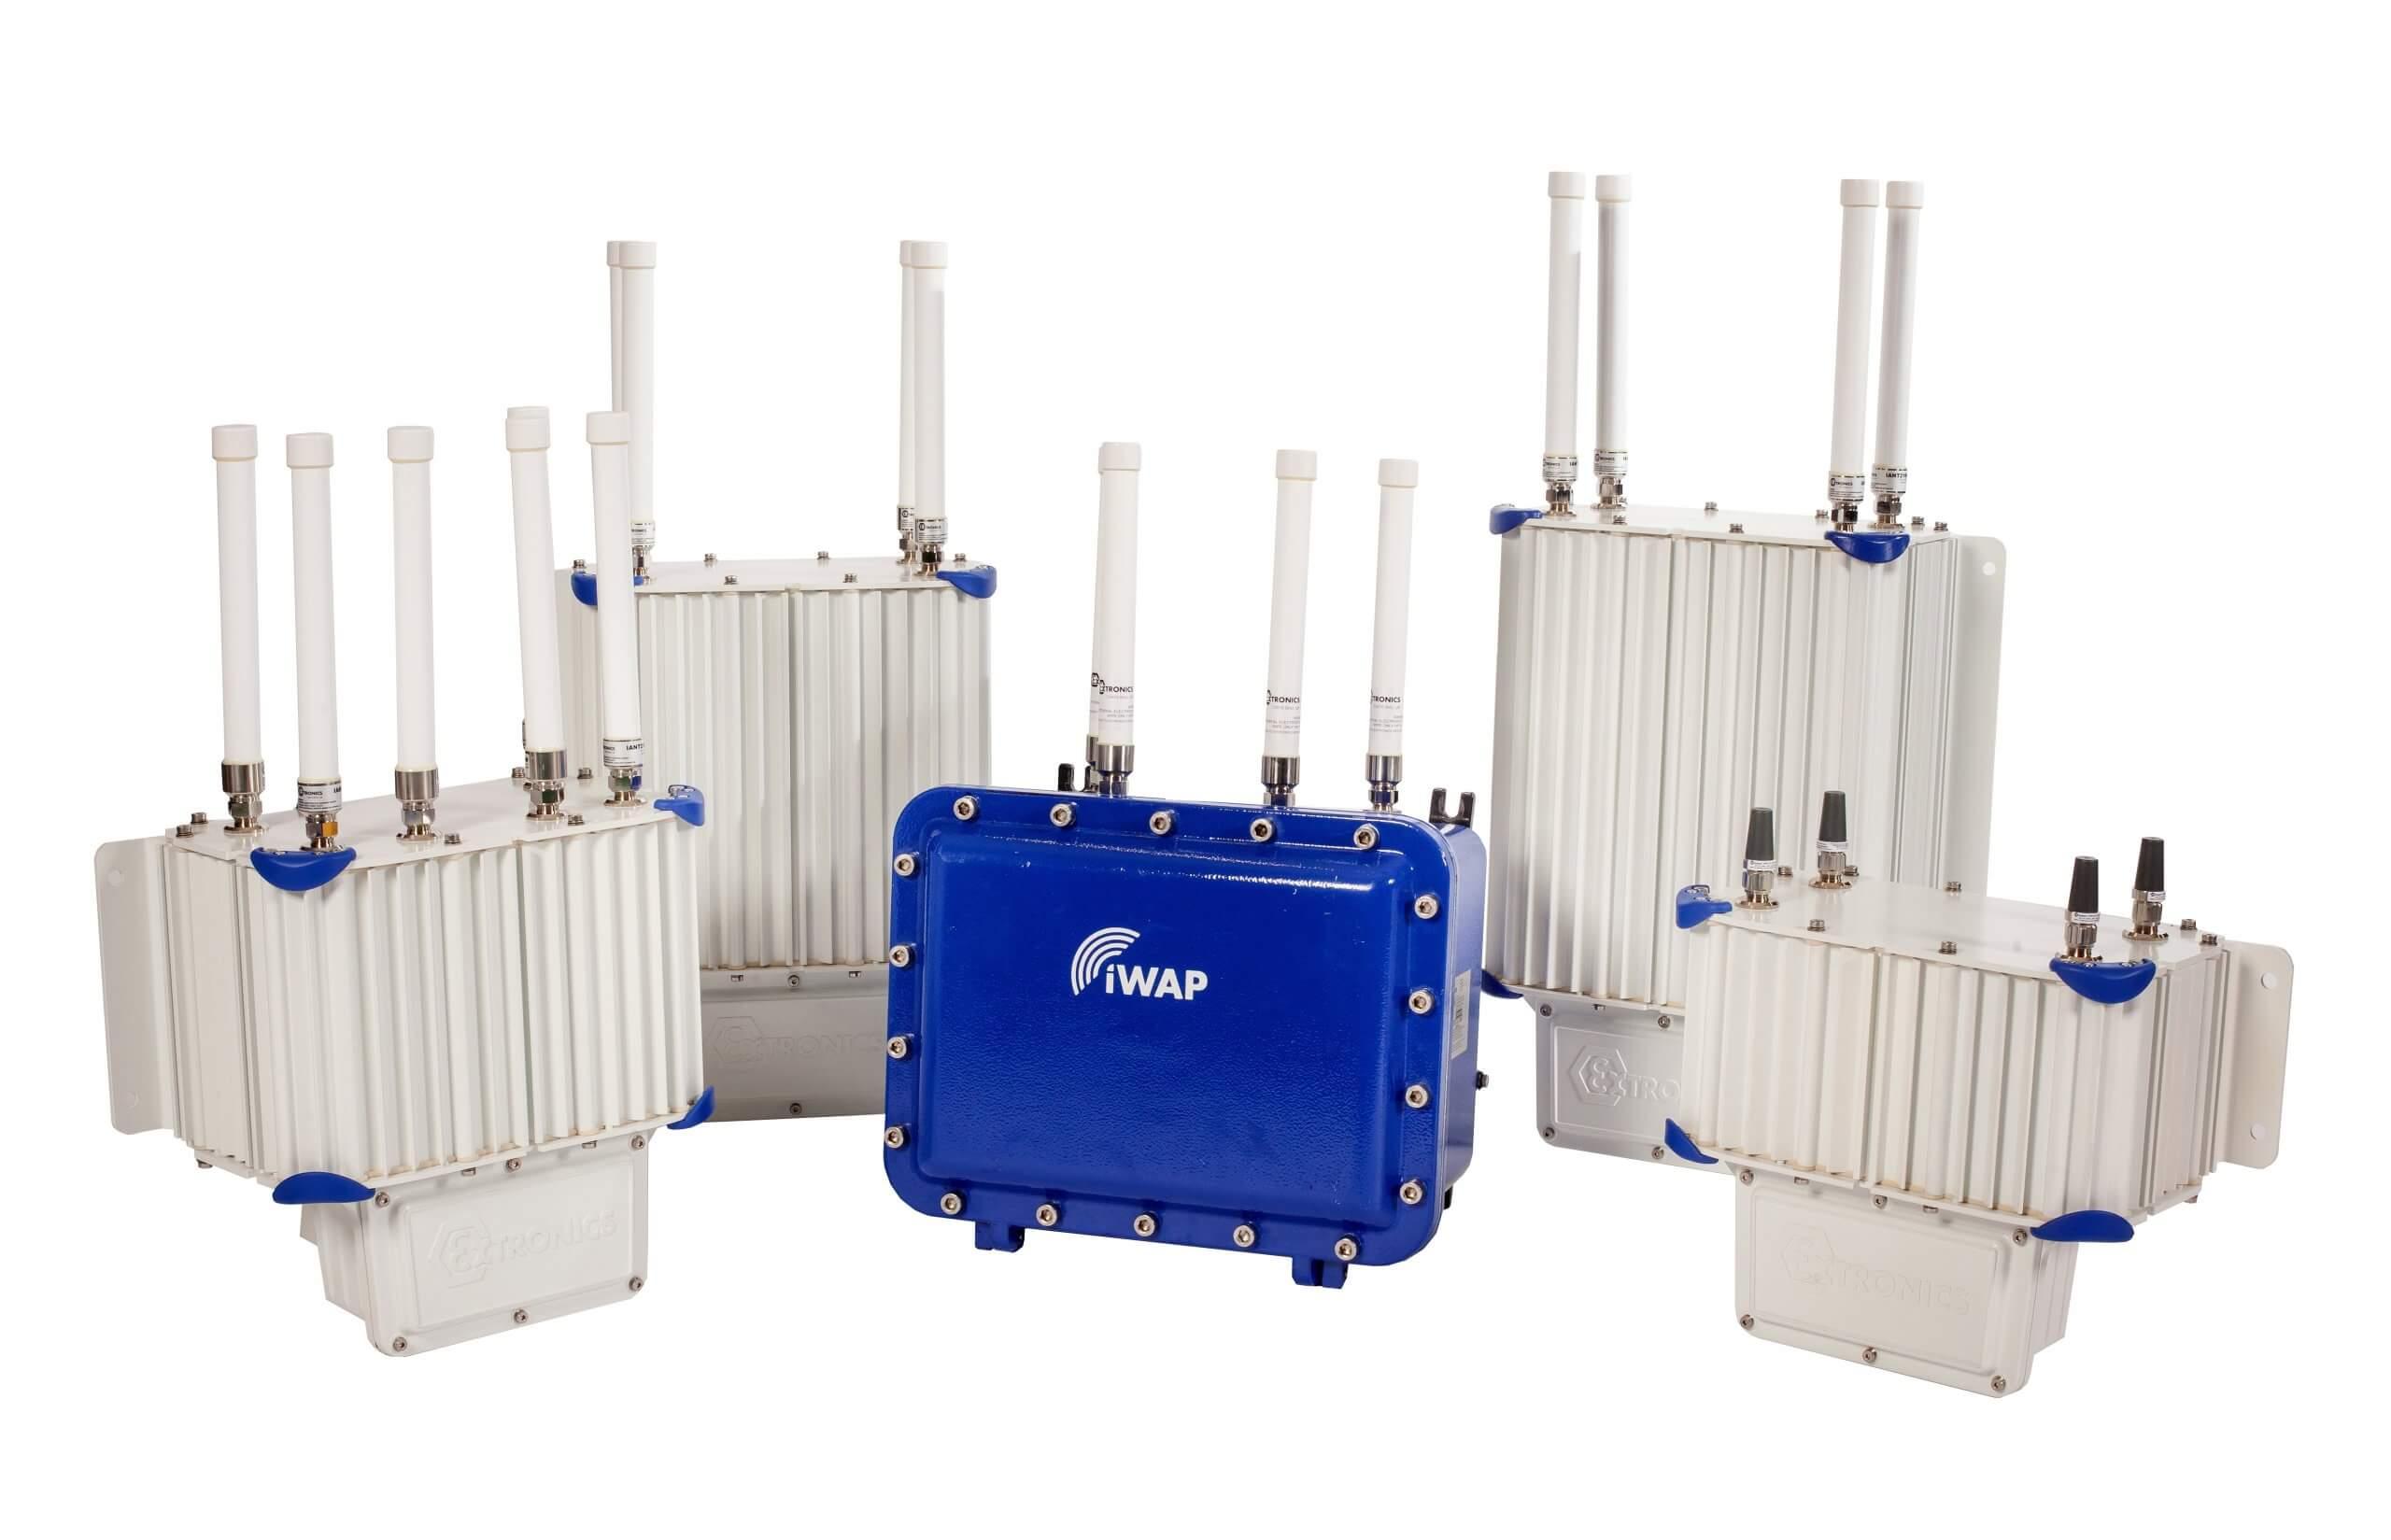 iWAP Hazardous area wireless enclosures